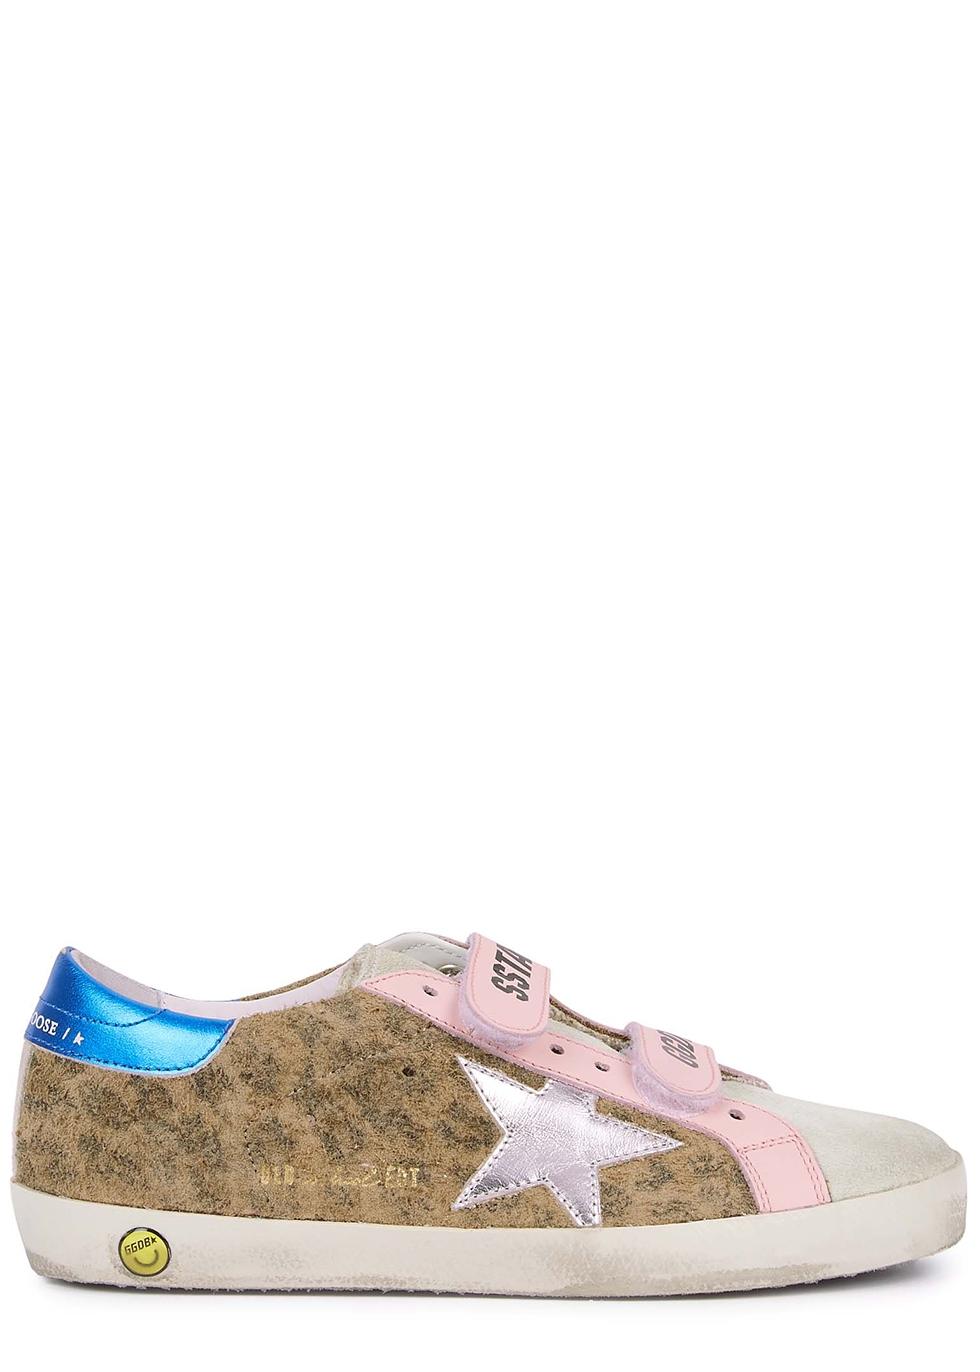 Old School panelled suede sneakers (IT28-IT35)